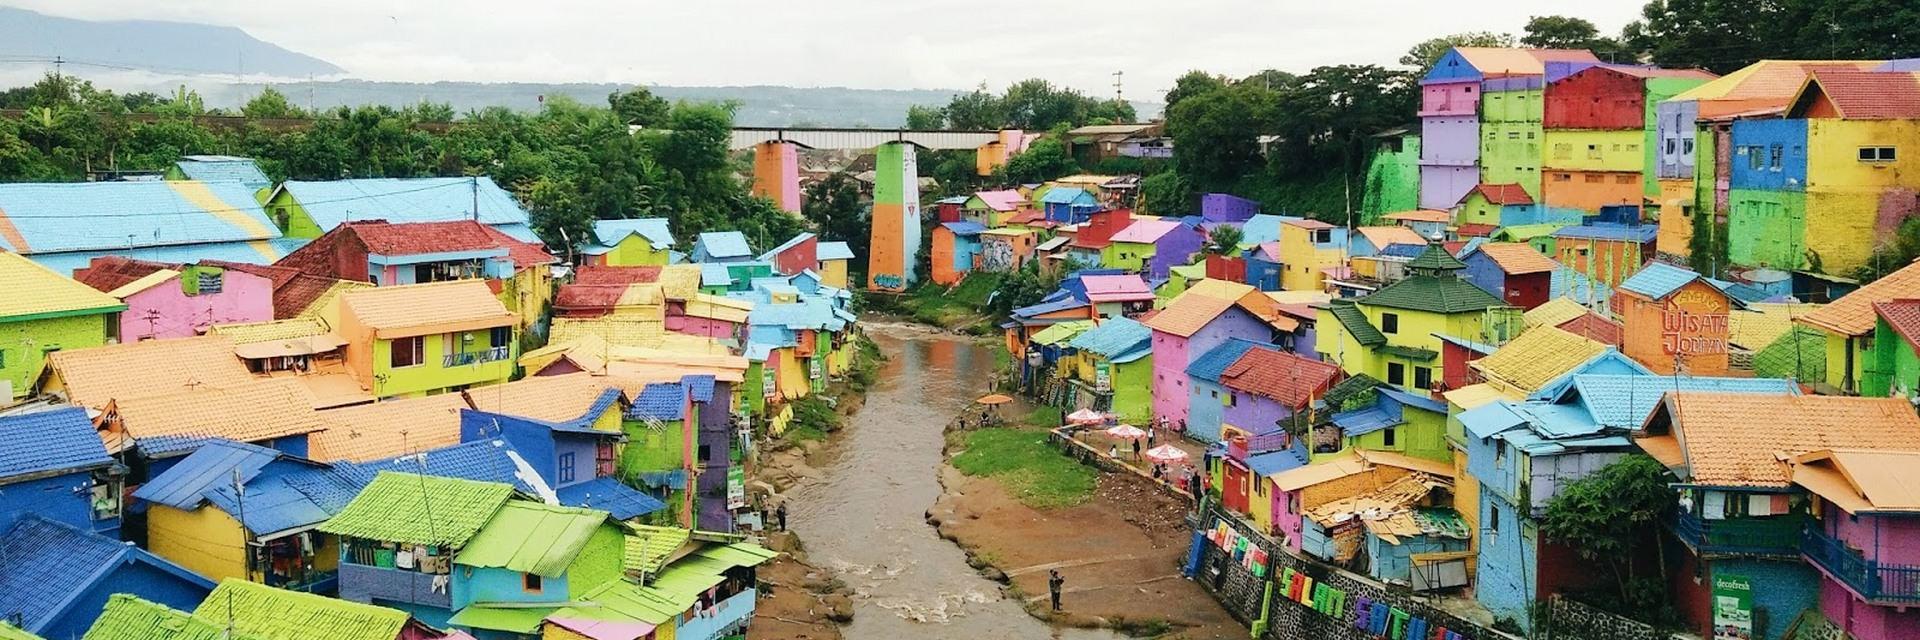 Mau Liburan Sambil Main Sepuasnya, Berpetualang di Kota Malang Aja